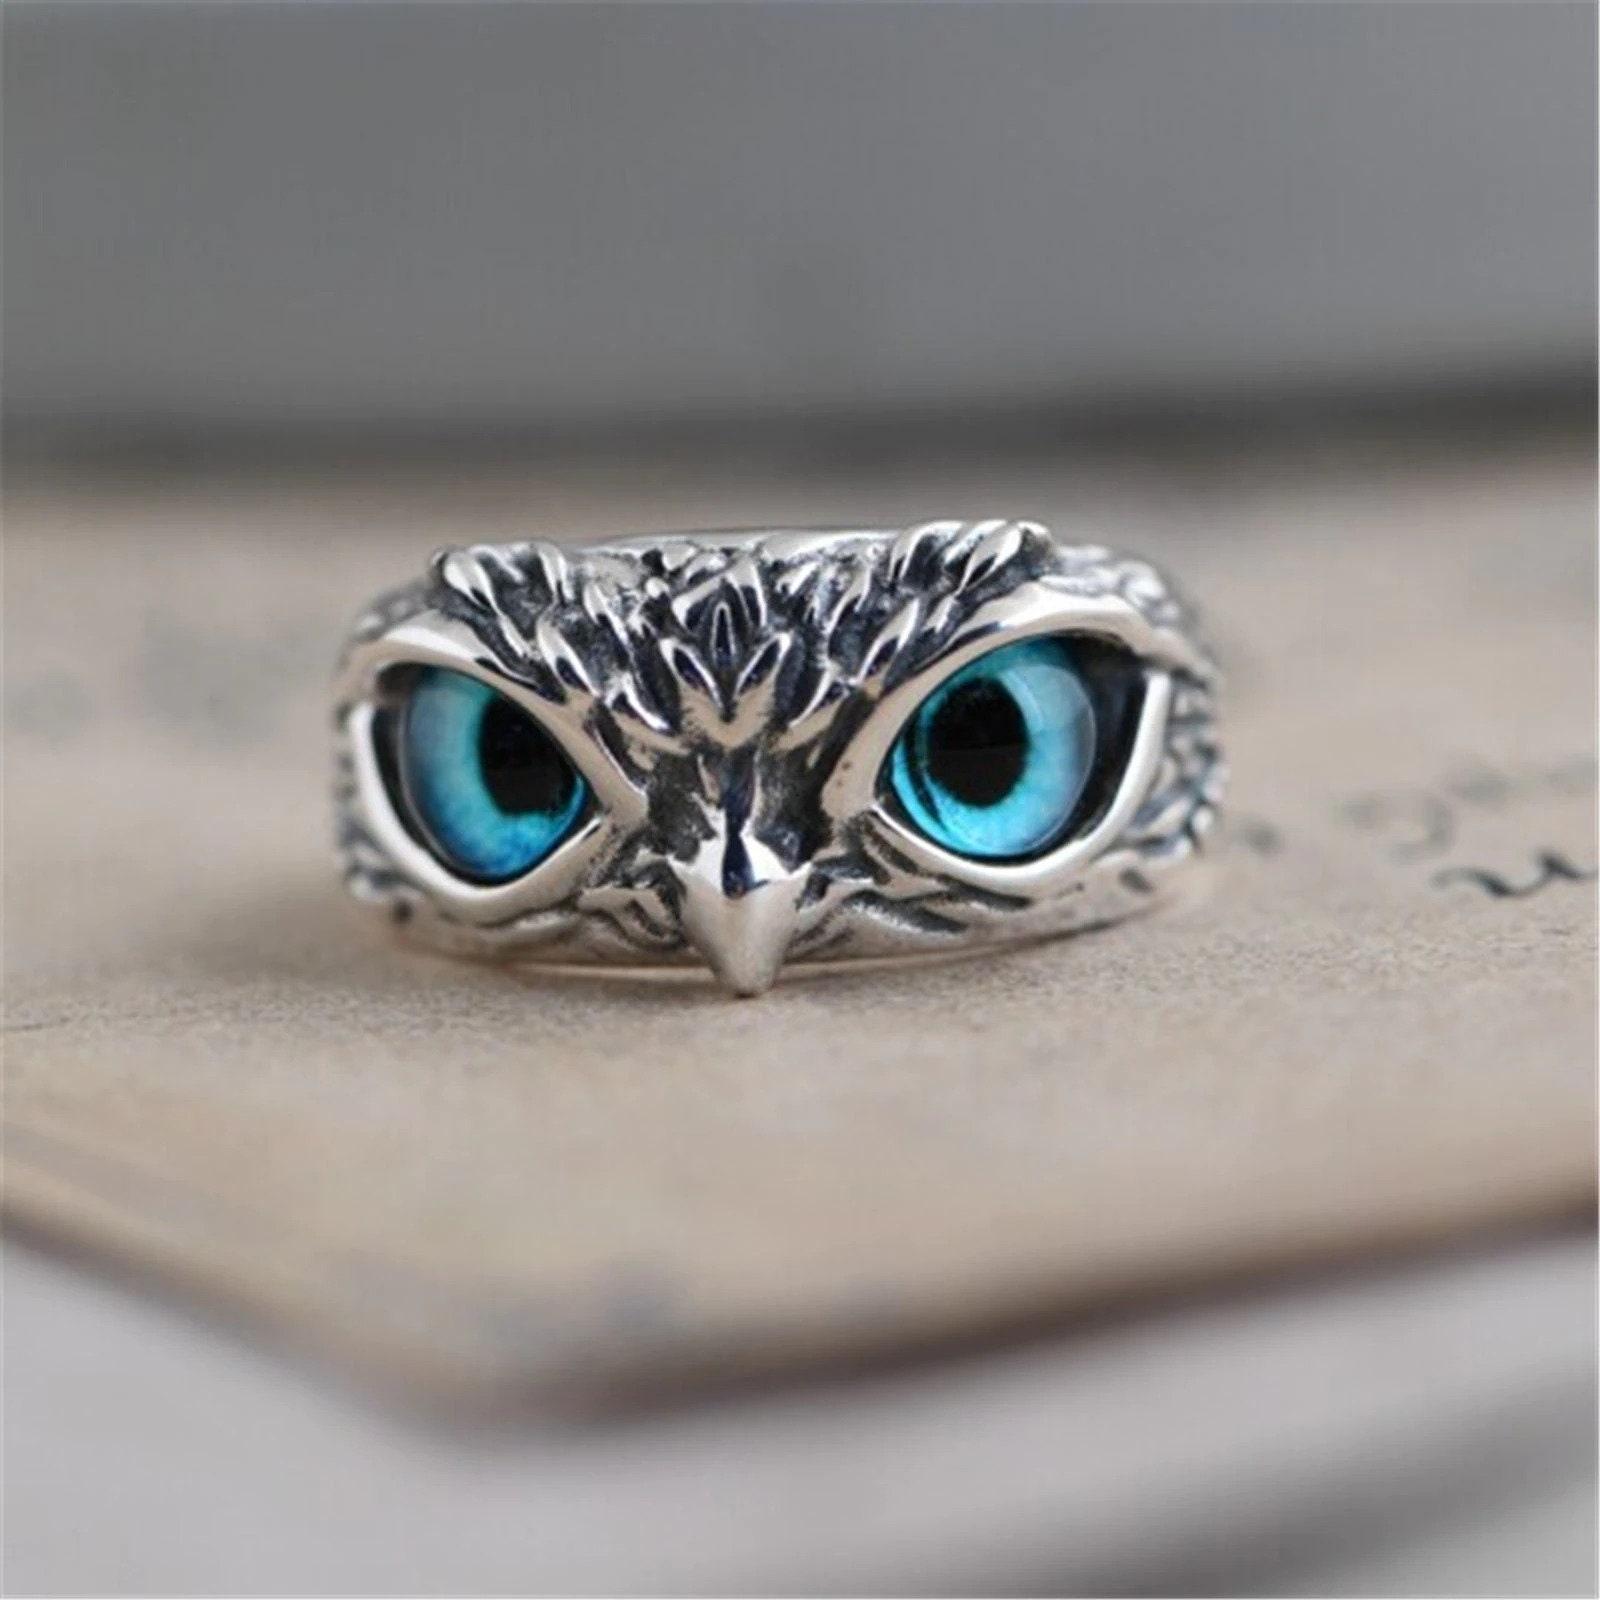 Adjustable Eye Owl Ring, Vintage Cute Design Owl Ring, Bird Lover Jewellery, Bird Ring, Fashion Ring, Women's jewelry, Wonderful Gift